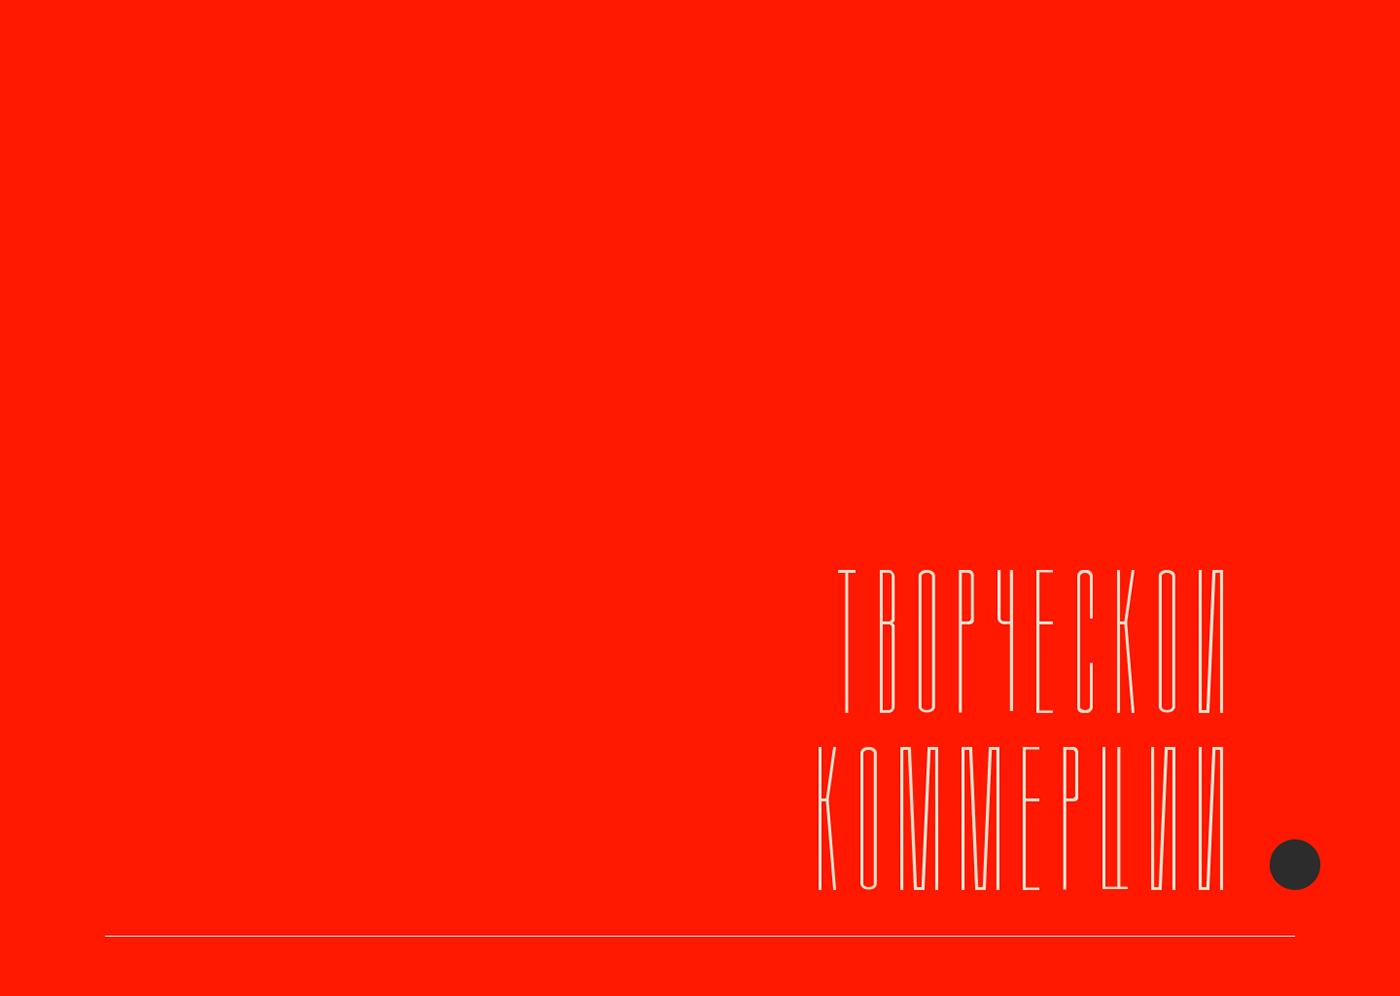 Image may contain: screenshot and red